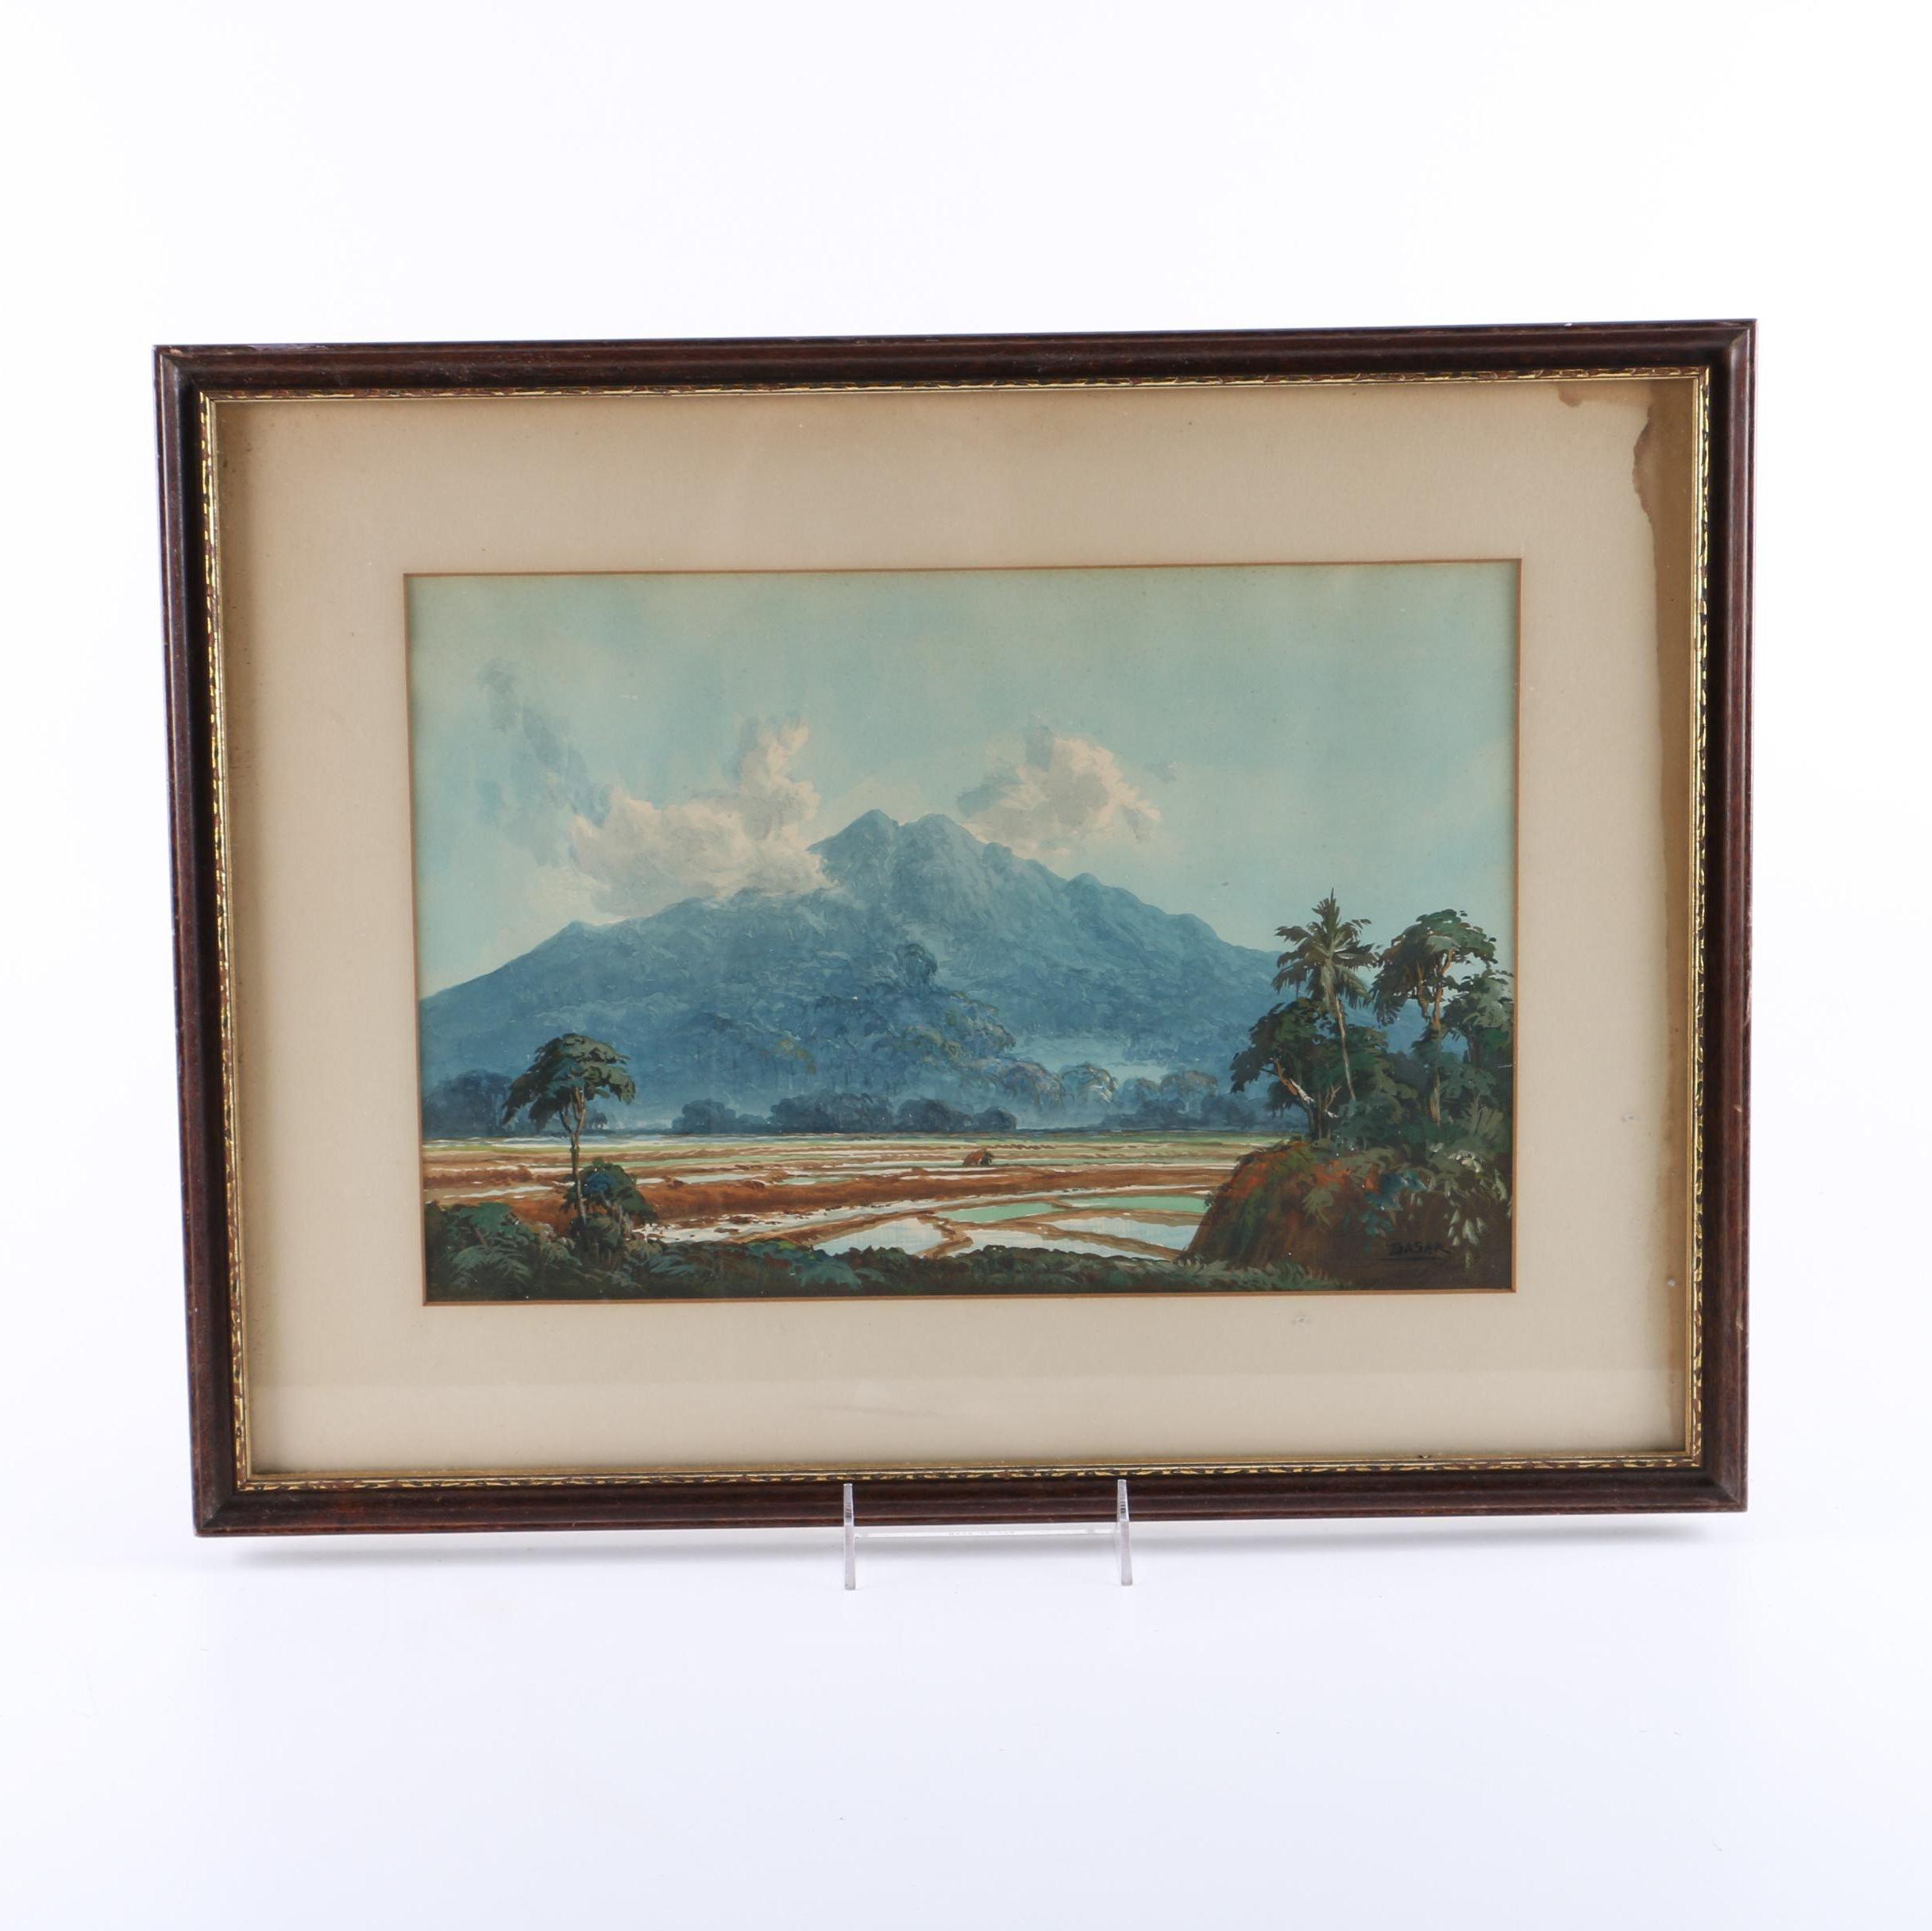 Basar Watercolor Landscape of Indonesian Mountain Scene